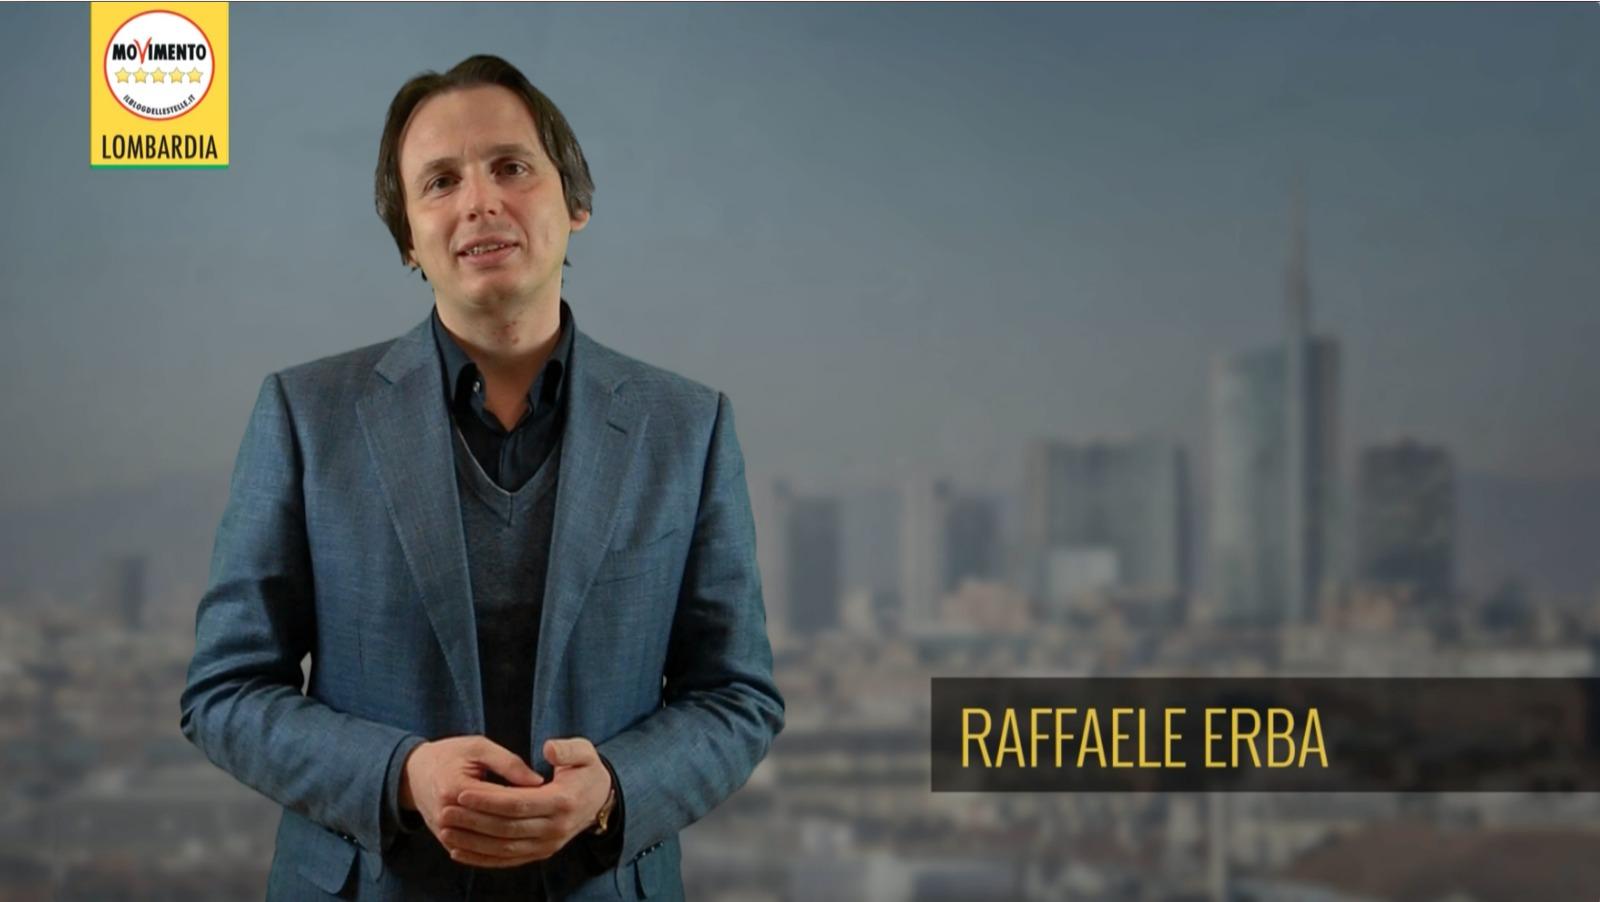 Conosciamo i consiglieri regionali: Raffaele Erba